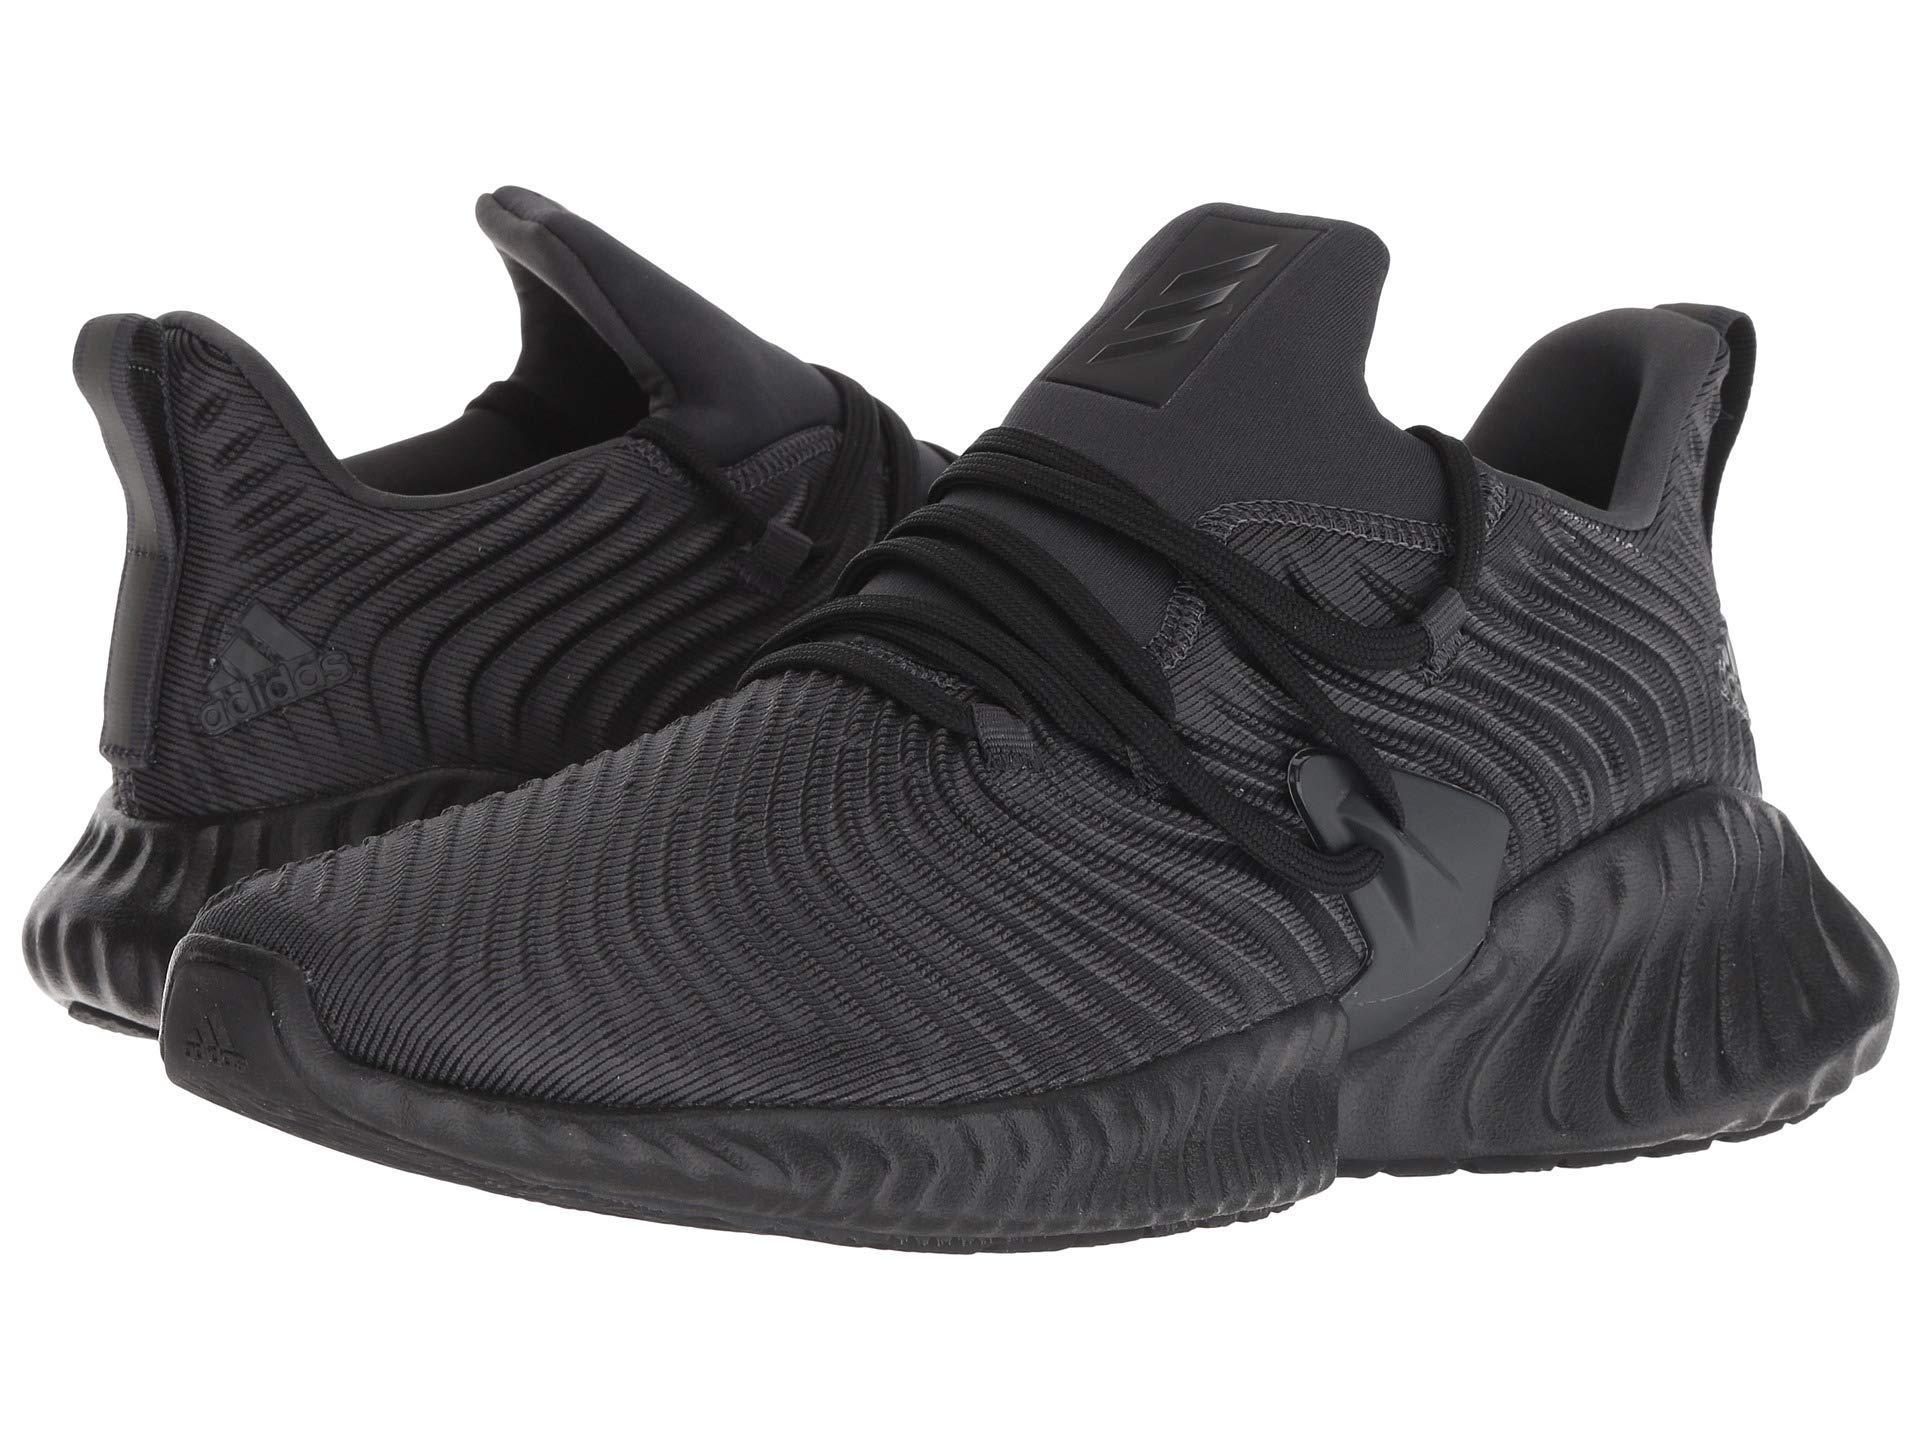 2d404a6adbb56 adidas Originals. Black Alphabounce Instinct (legend Marine legend  Marine shock Cyan) Men s Running Shoes